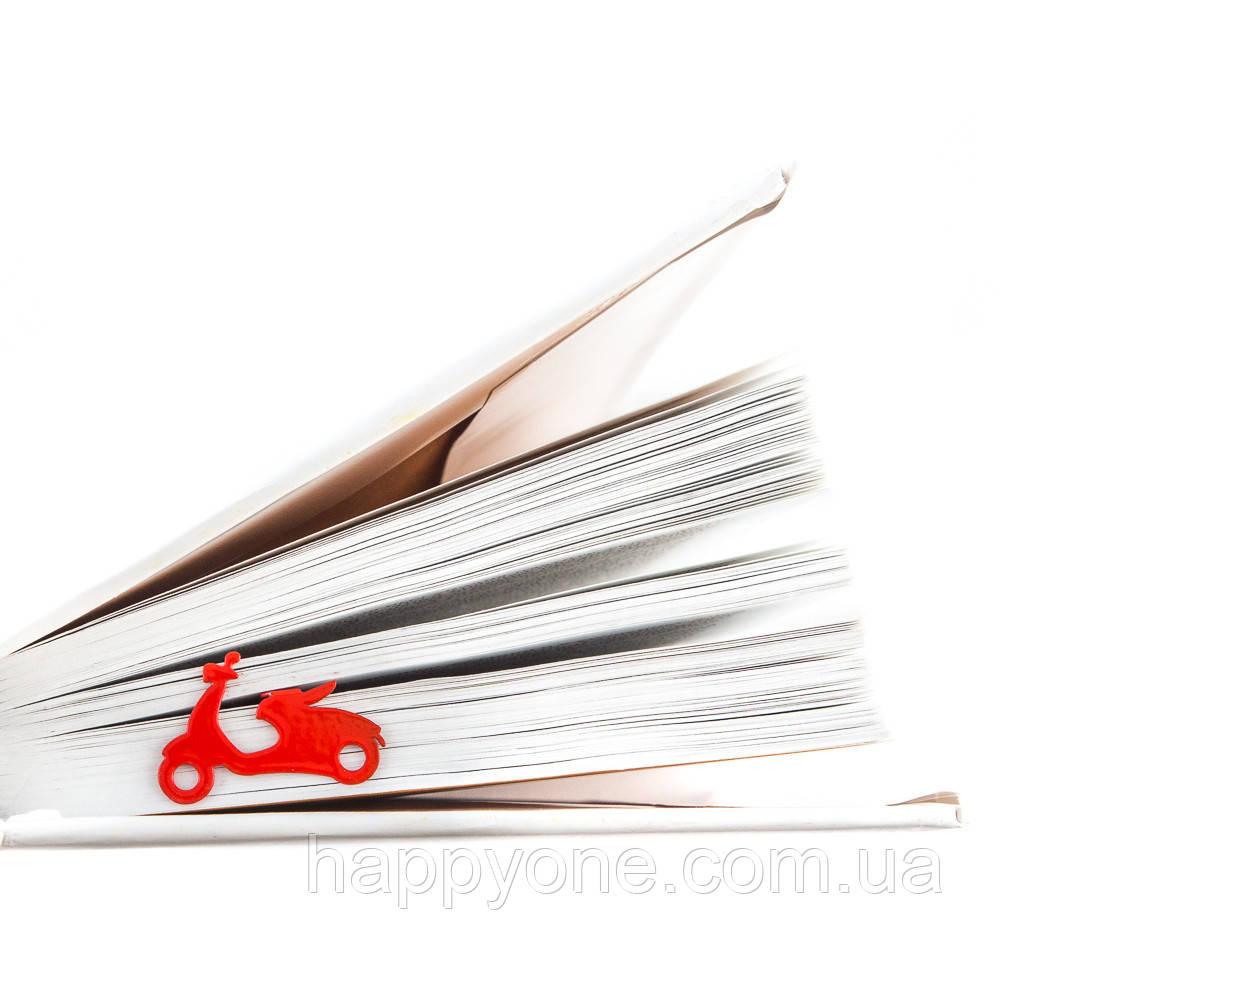 Закладка для книг Мопед (красная)